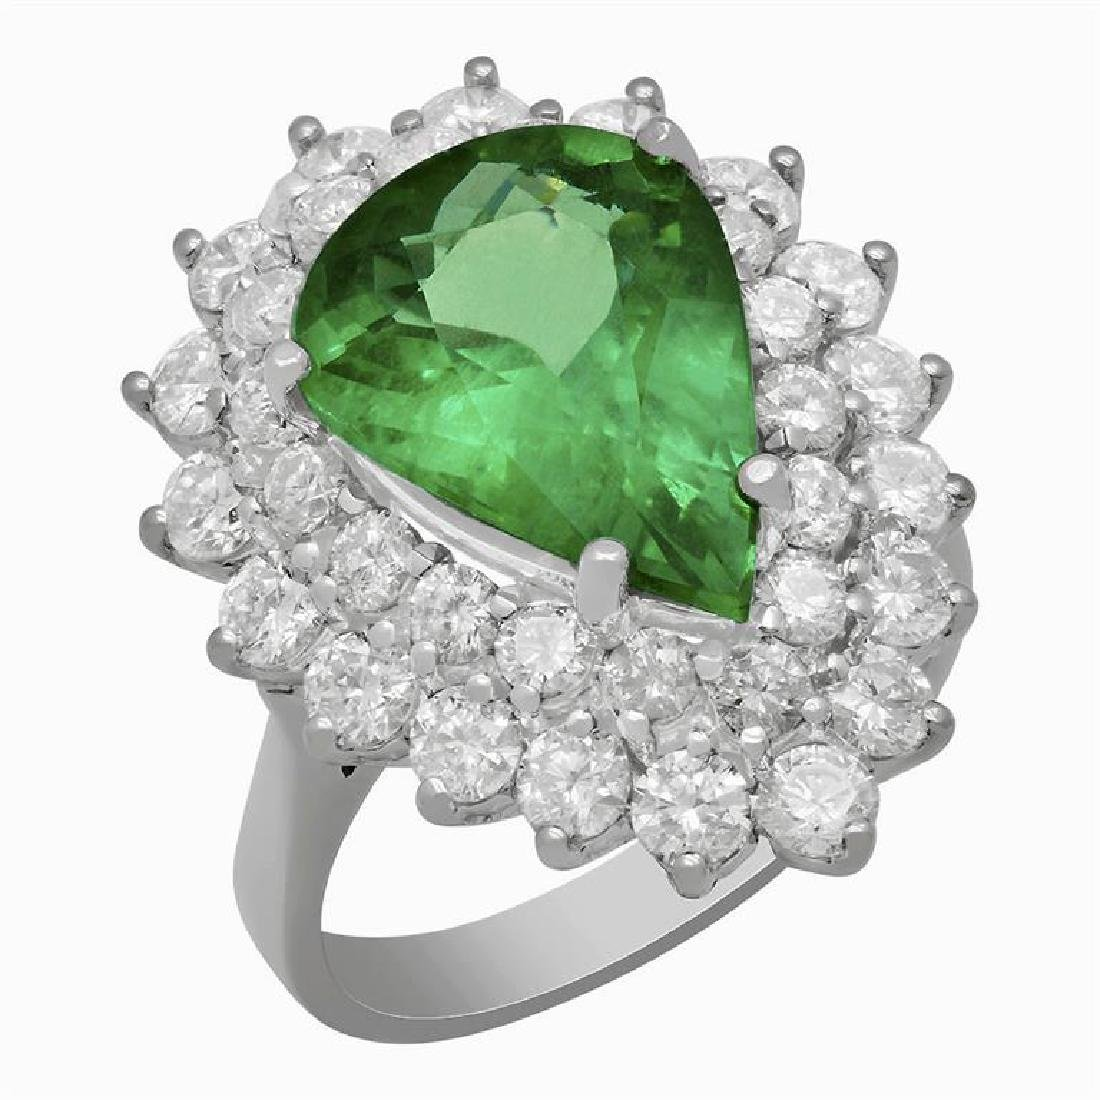 14k White Gold 4.92ct Emerald 2.66ct Diamond Ring